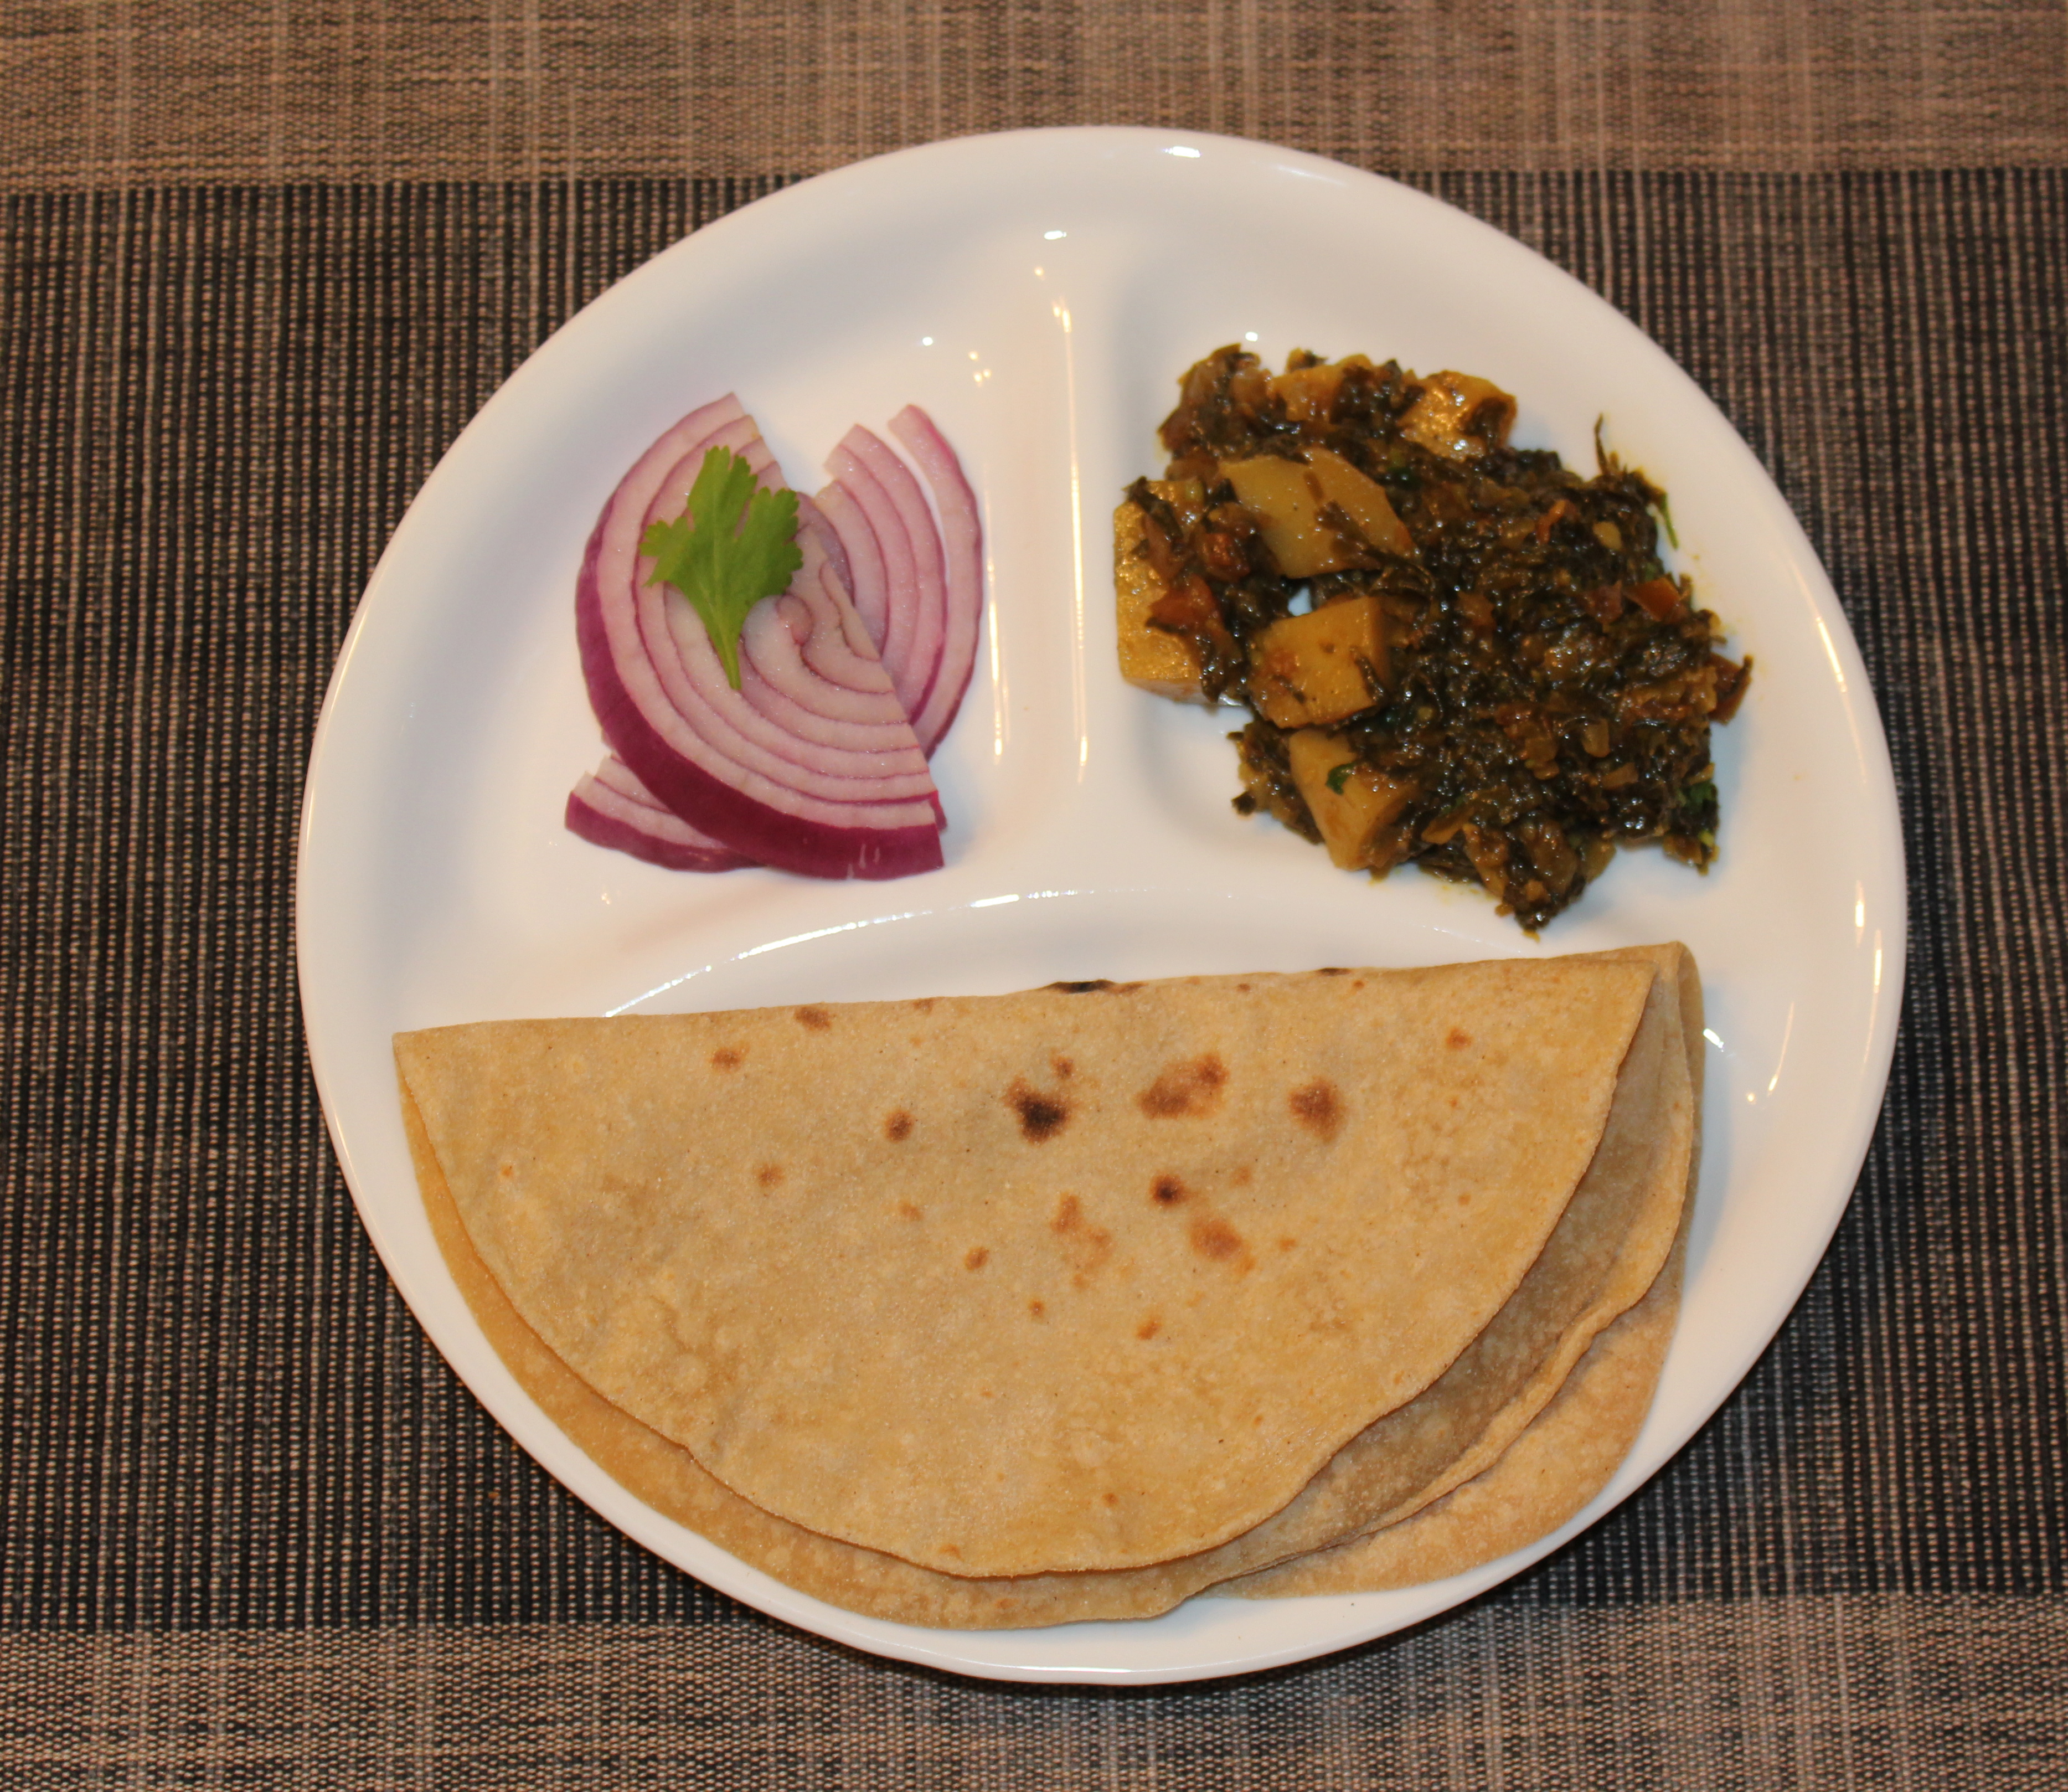 Methi Aloo (Fenugreek leaves with potatoes) – CurryLore